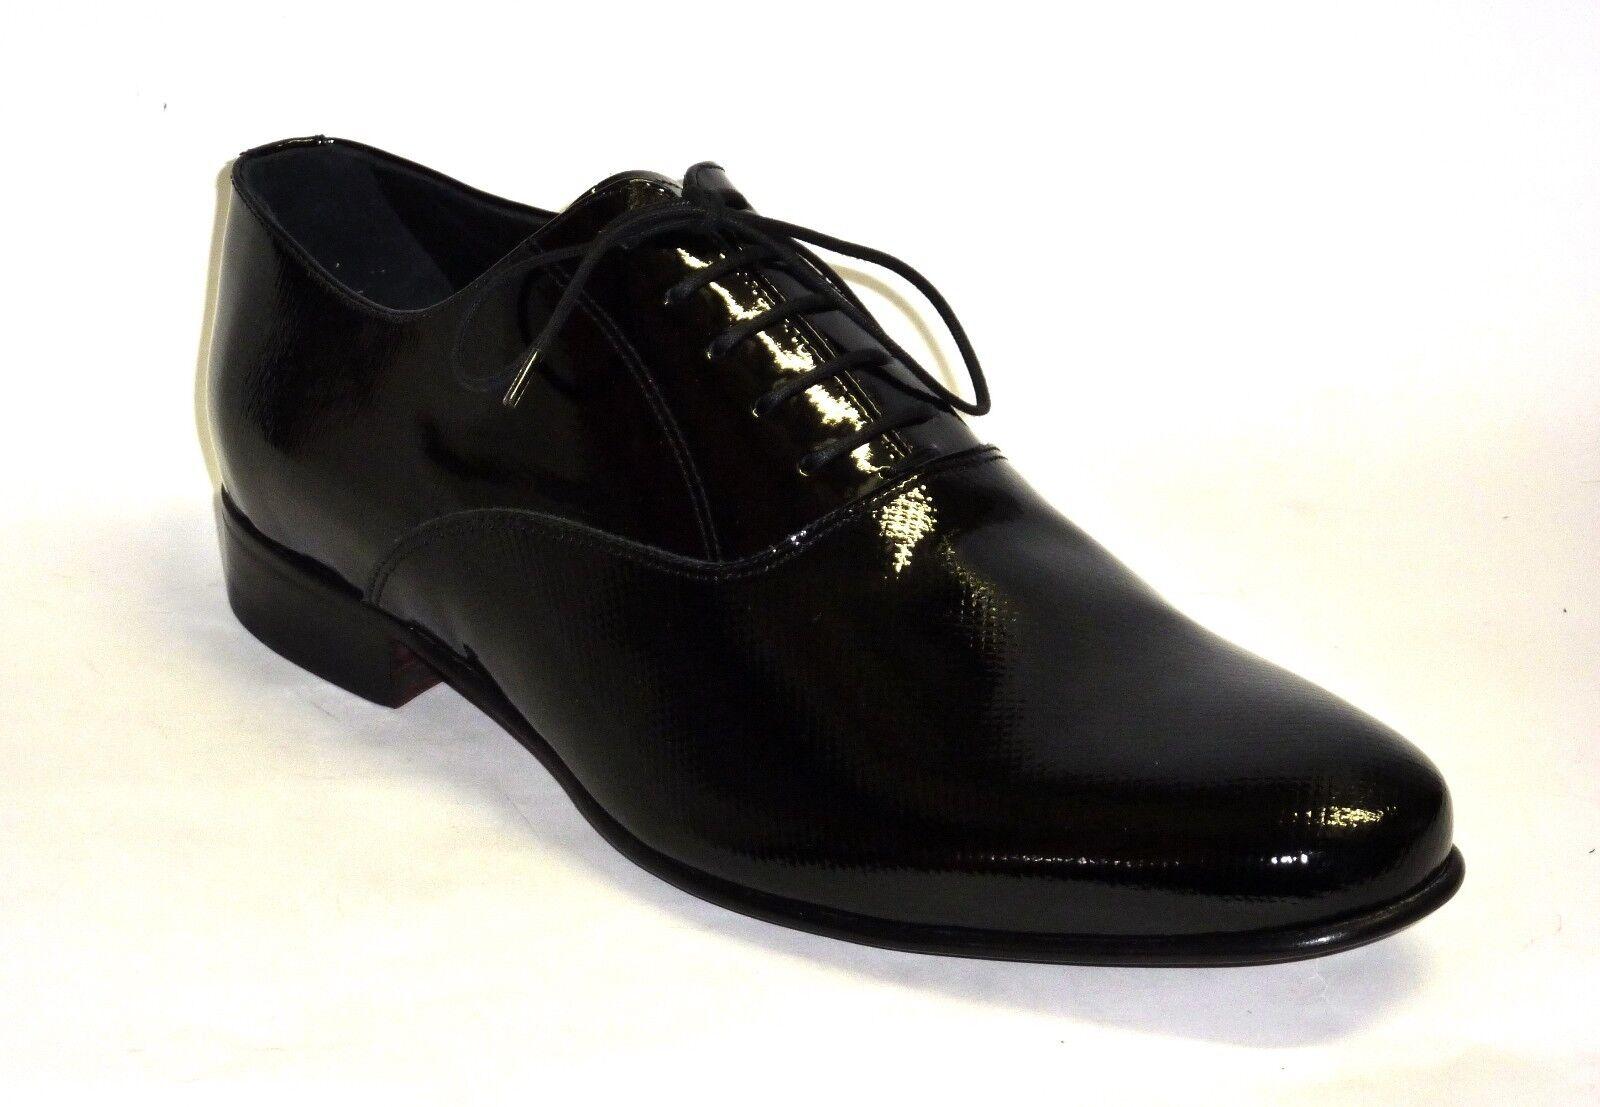 U24412 MELLUSO zapatos hombres ALLACCIATE PELLE VERNICE negro MODA COMODA LUX  n. 42